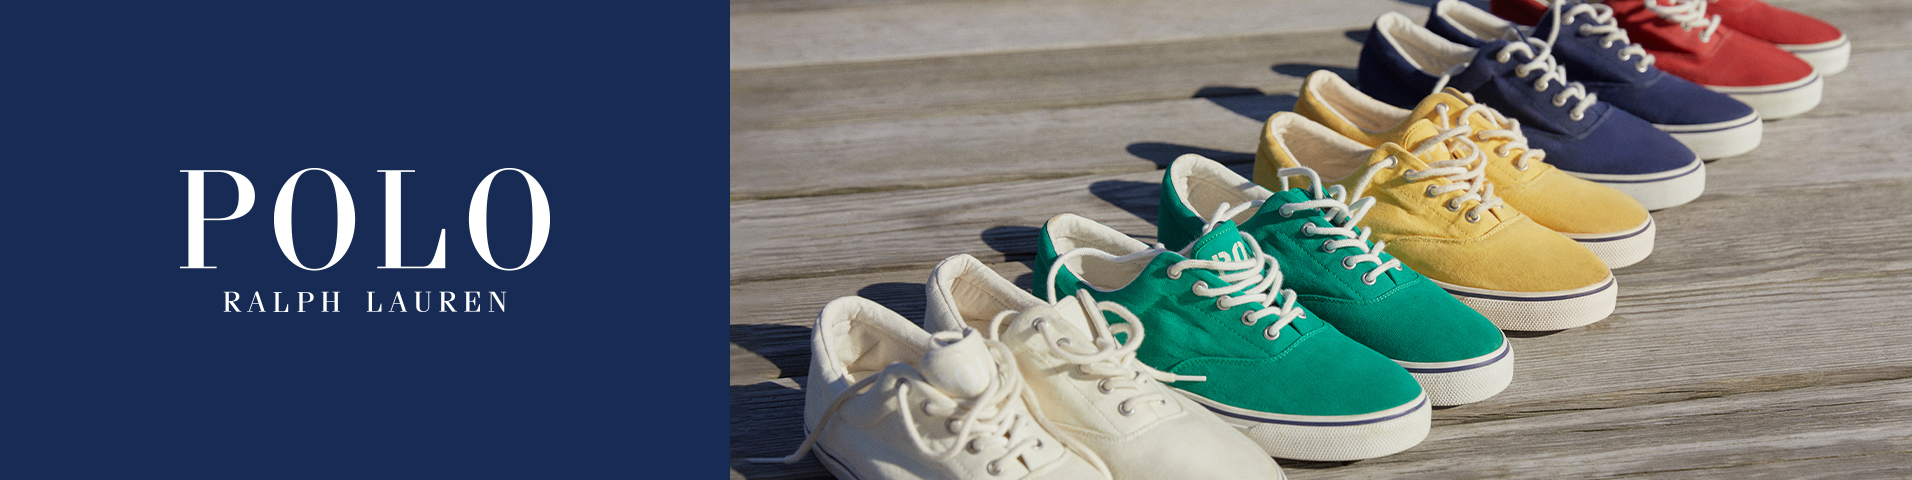 Escarpins Polo Ralph Lauren en ligne sur la boutique Zalando